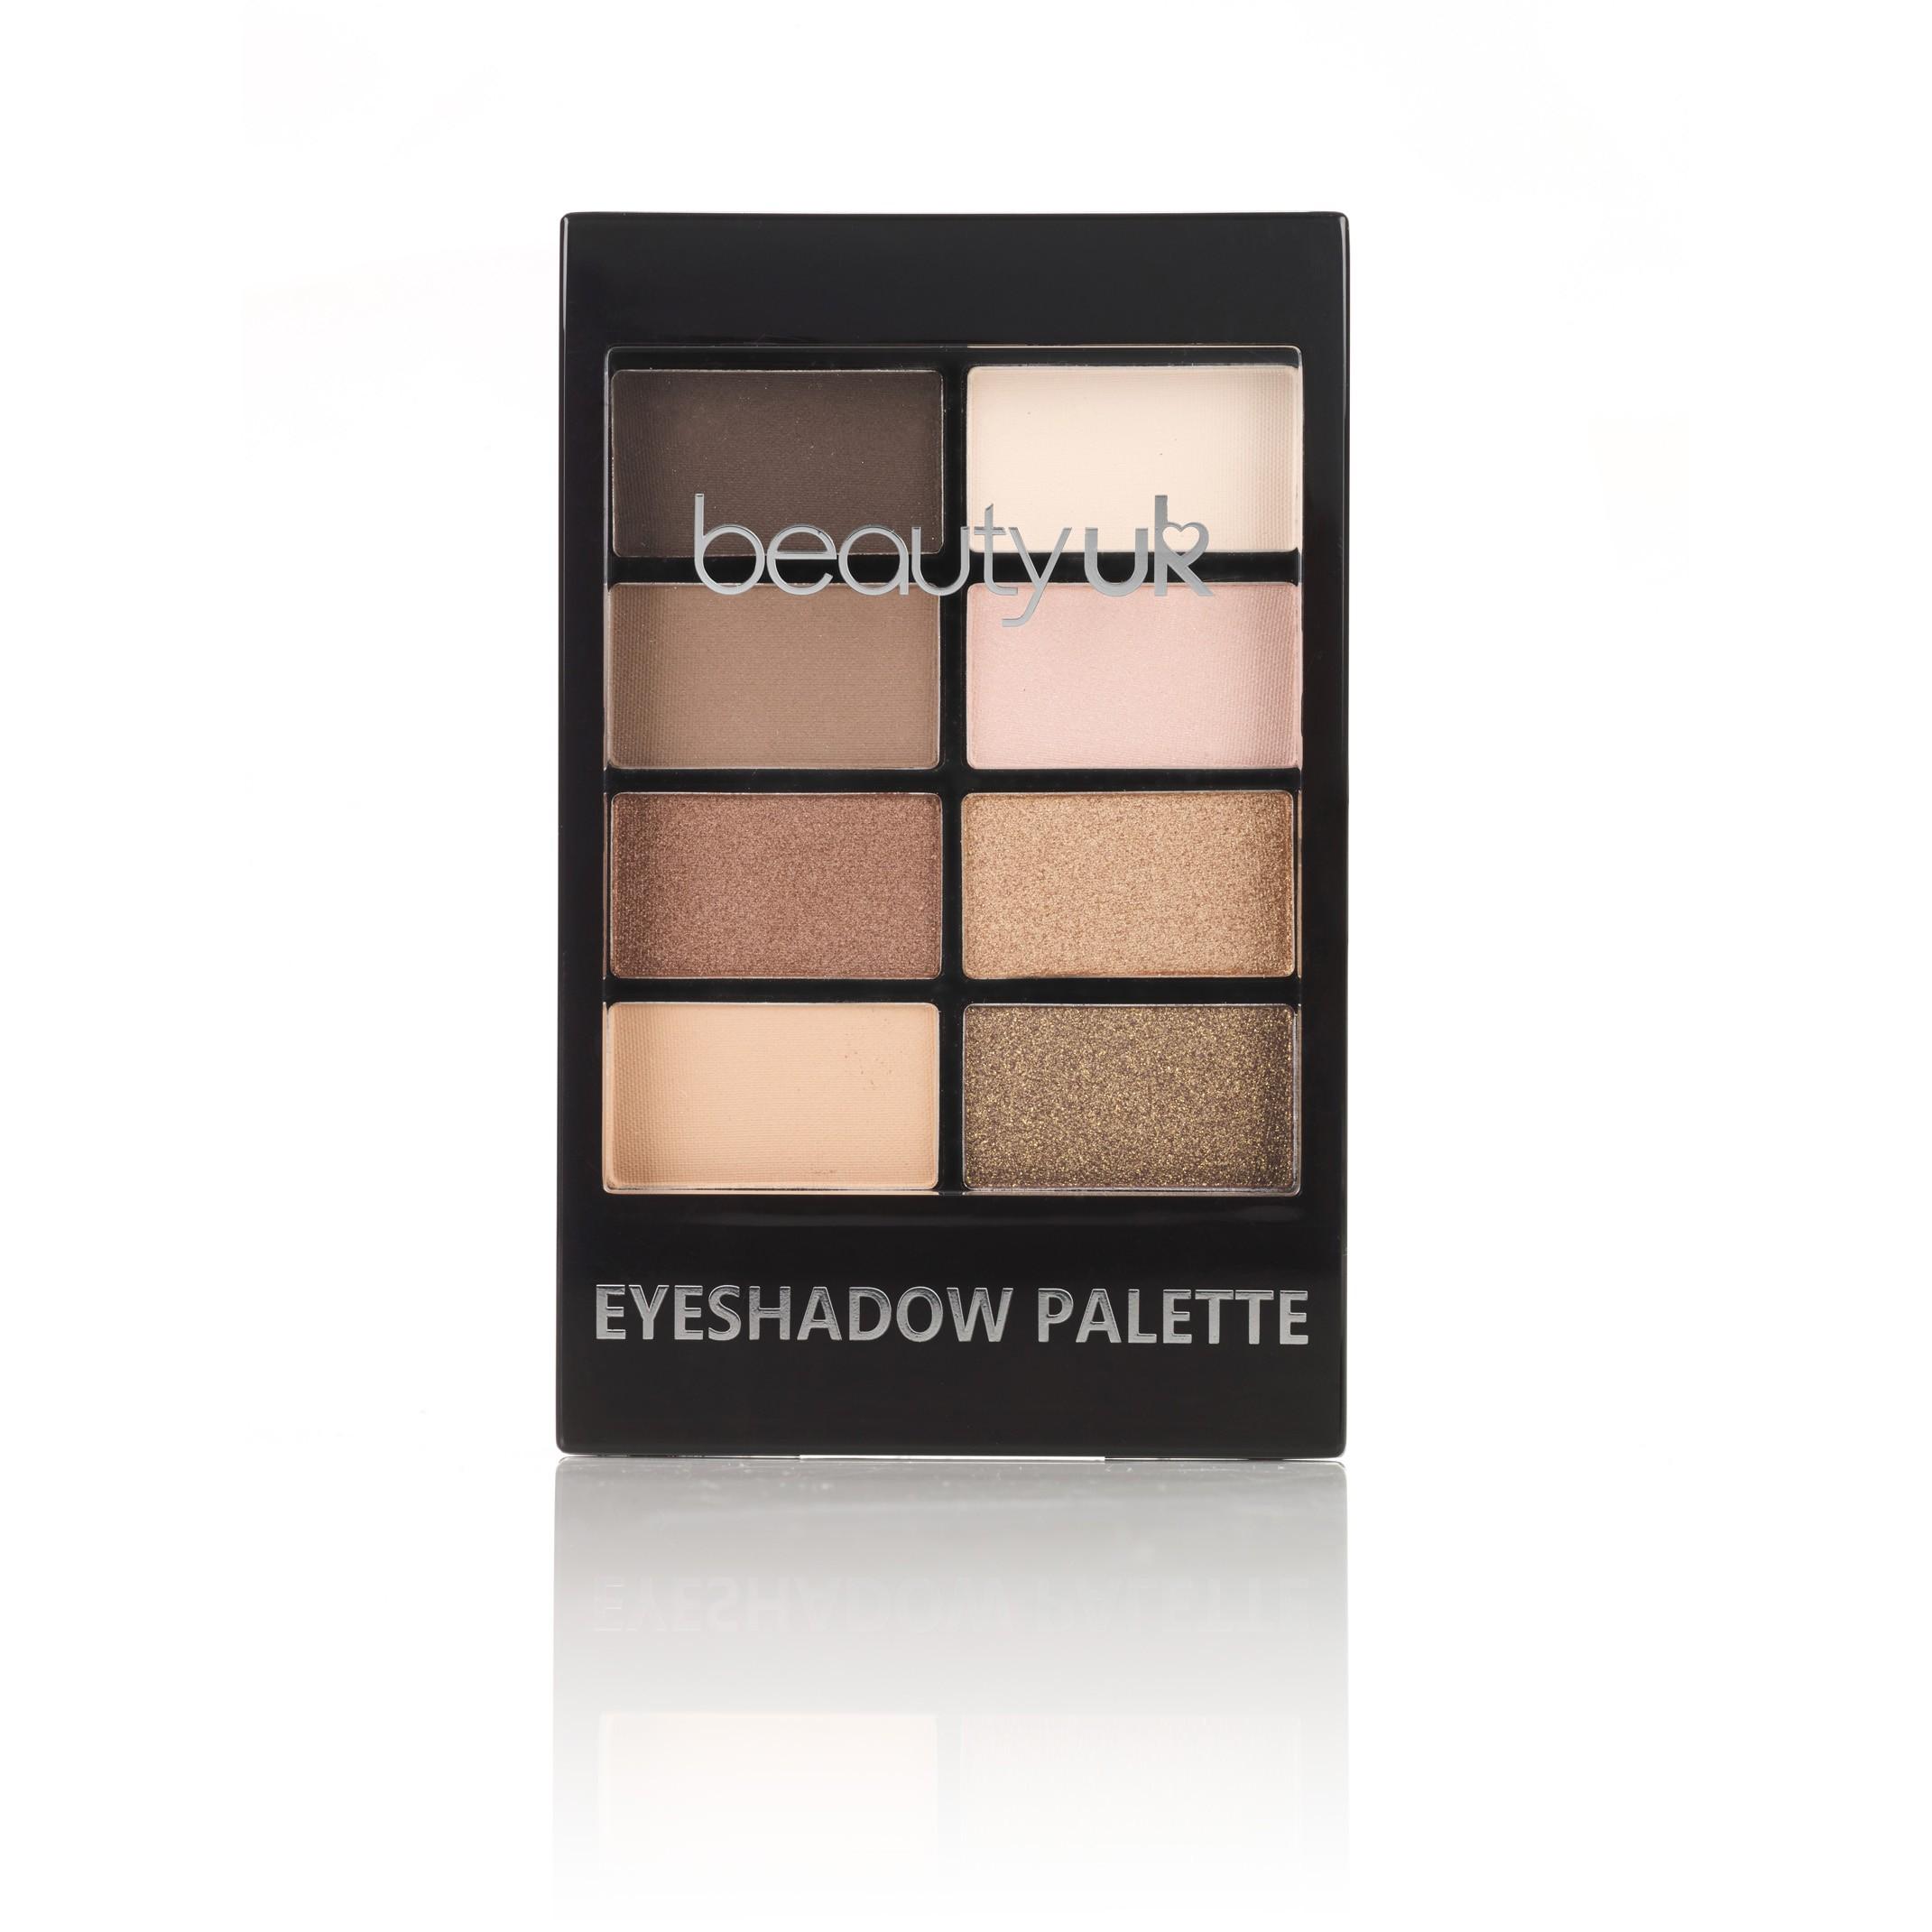 Image of beautyUK - Lidschatten-Palette - Eyeshadow Palette (ES024PU)